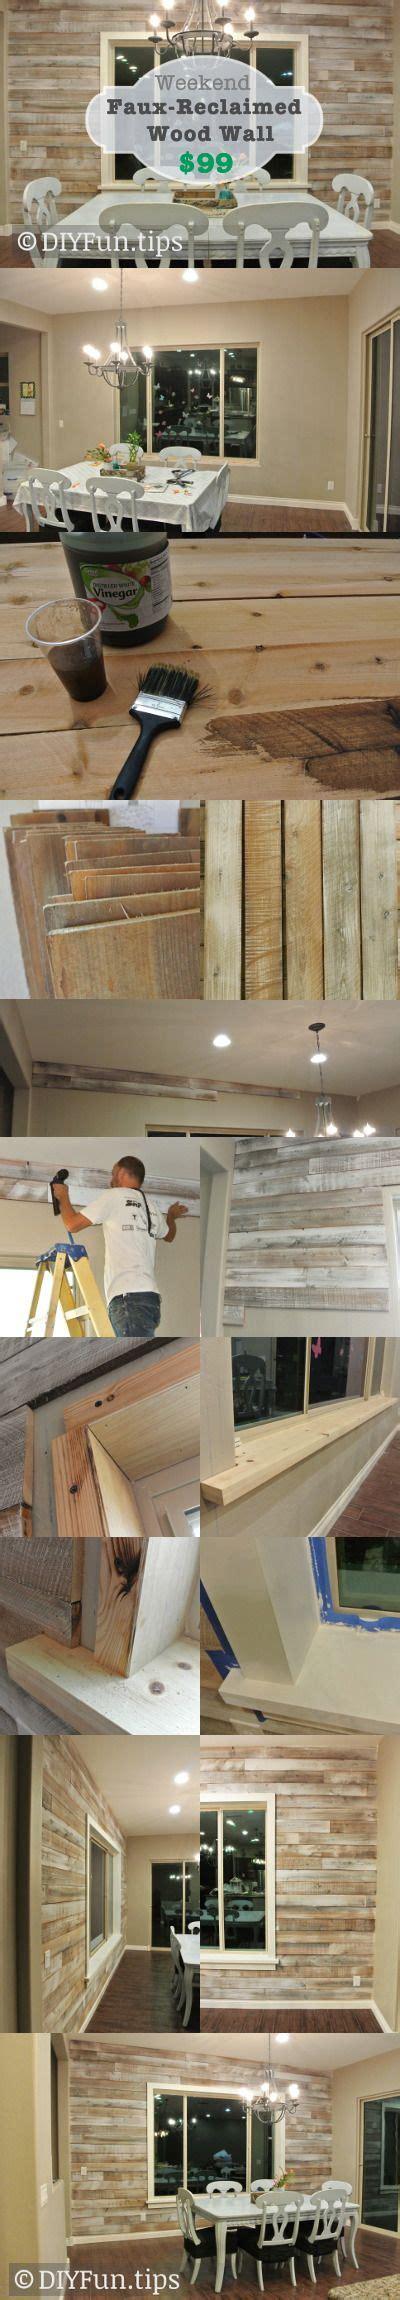 diy faux reclaimed wood wall put   reclaimed wood